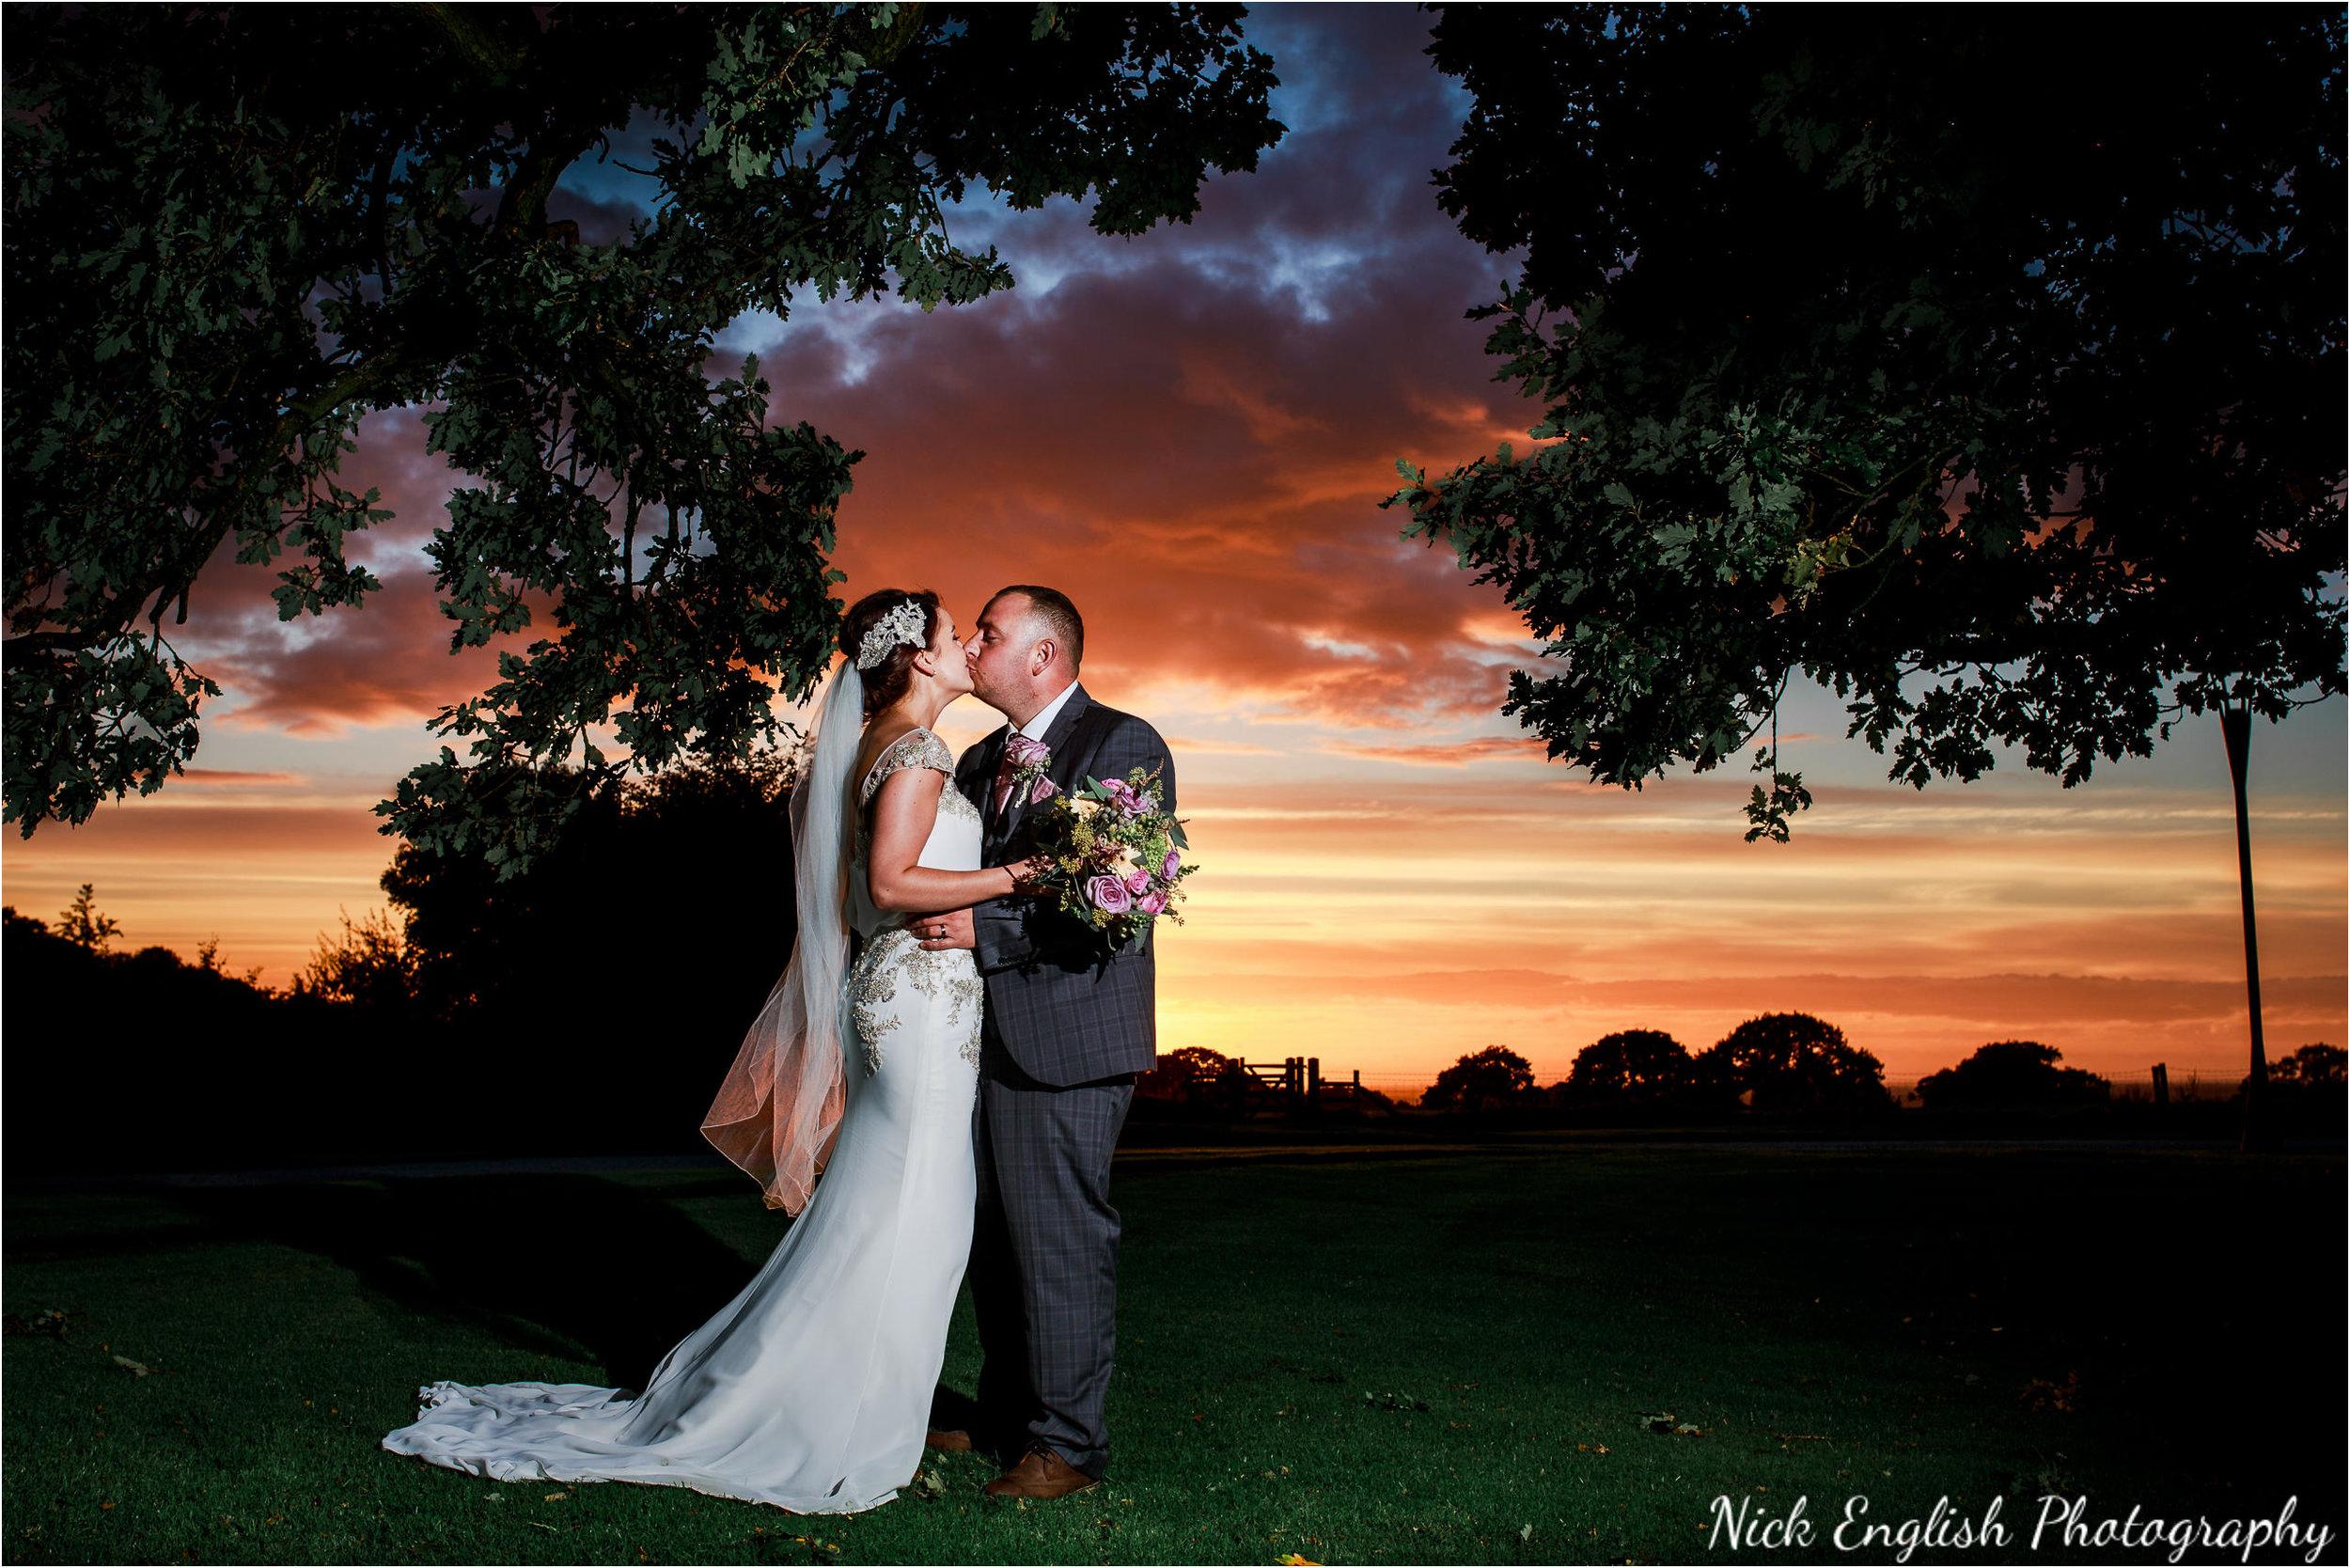 Stacey-Ash-Wedding-Photographs-Stanley-House-Preston-Lancashire-230.jpg